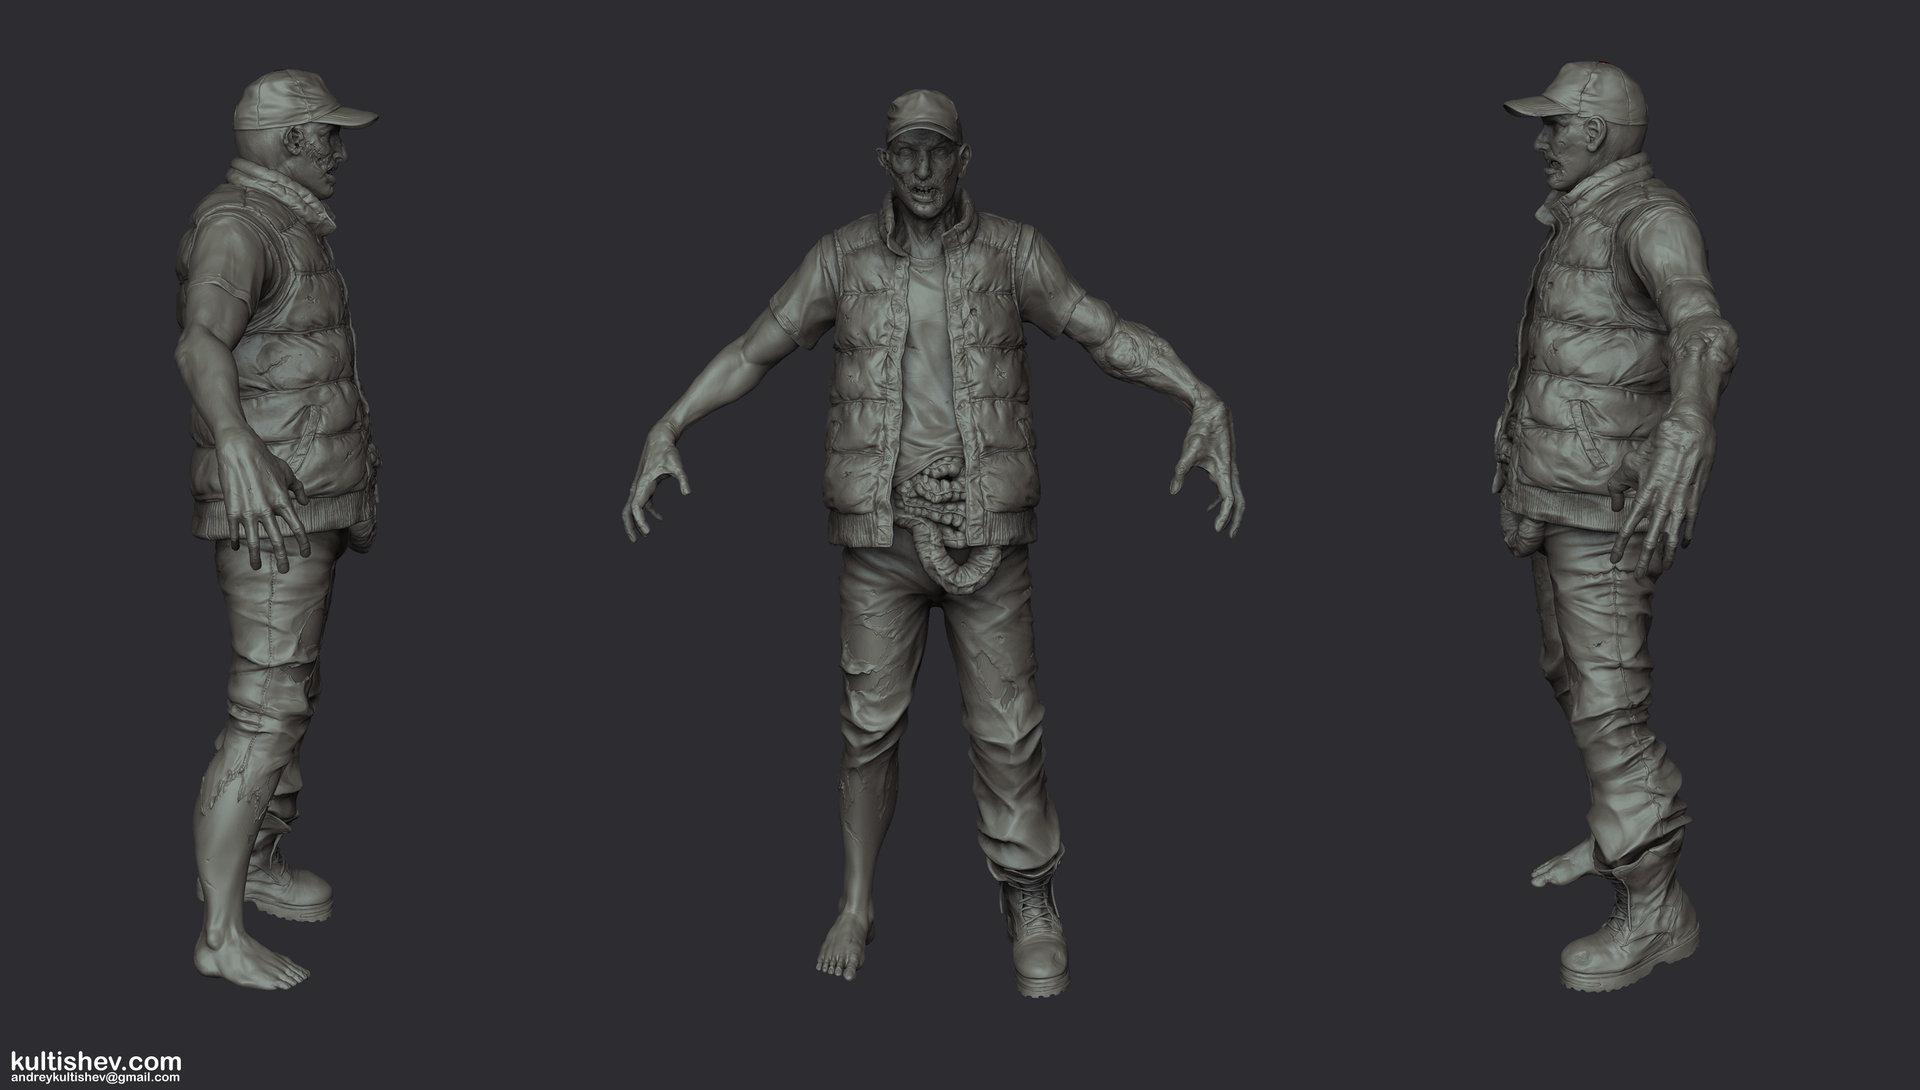 Andrey kultishev kultishev zombie sculpt02